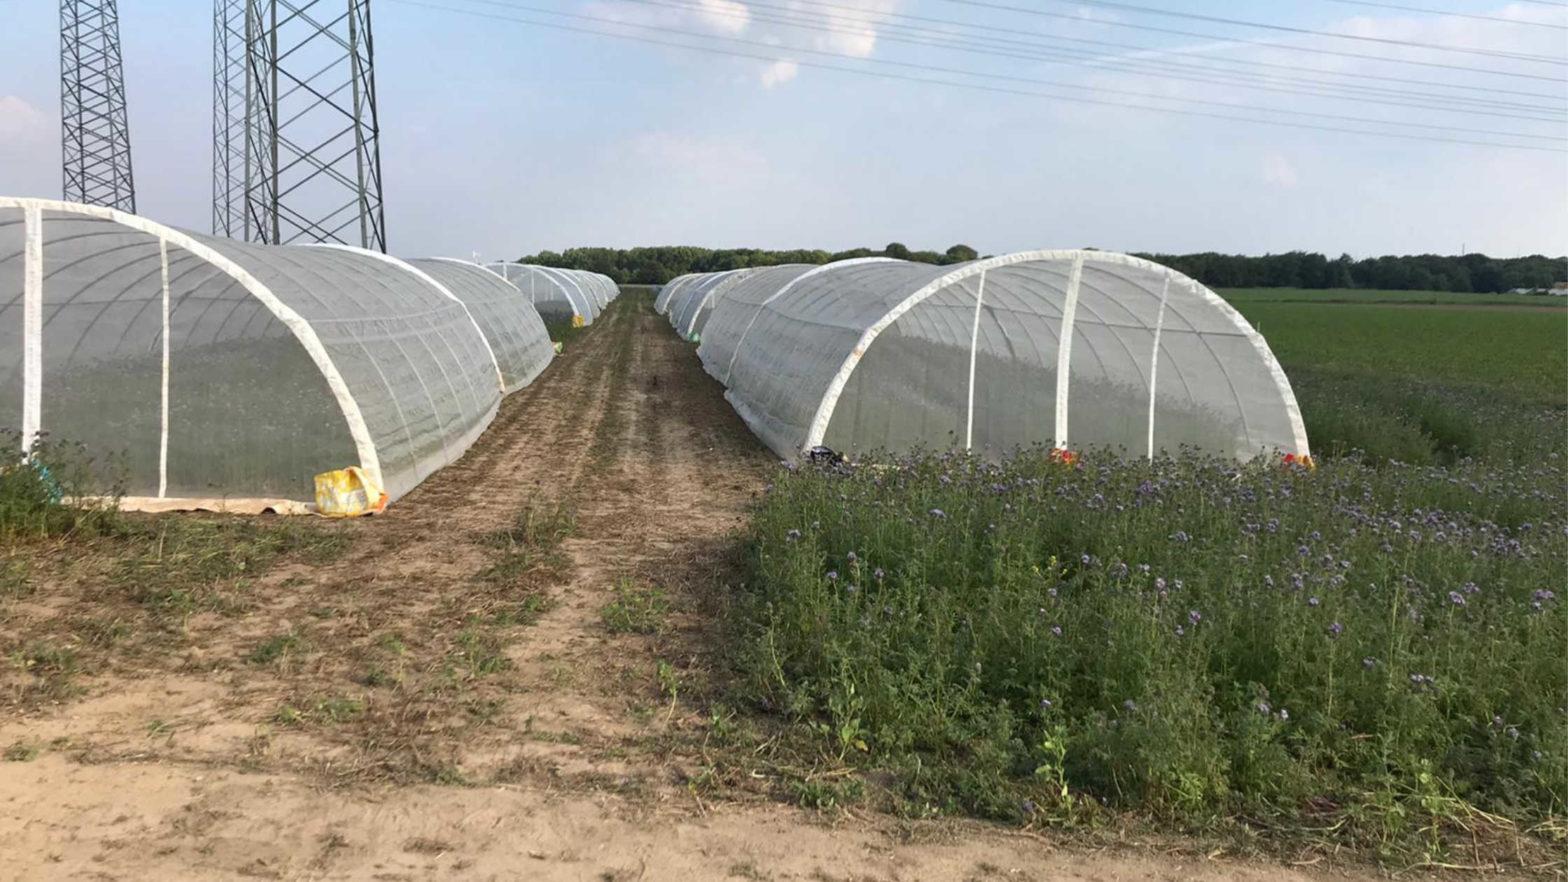 impact of climate change on pollinators